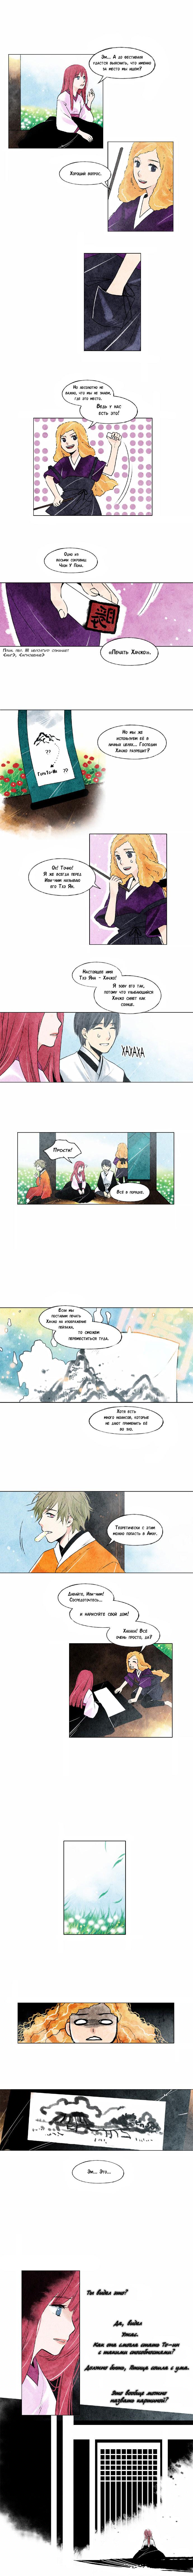 https://r1.ninemanga.com/comics/pic2/39/22503/1257042/1541334756944.jpg Page 2